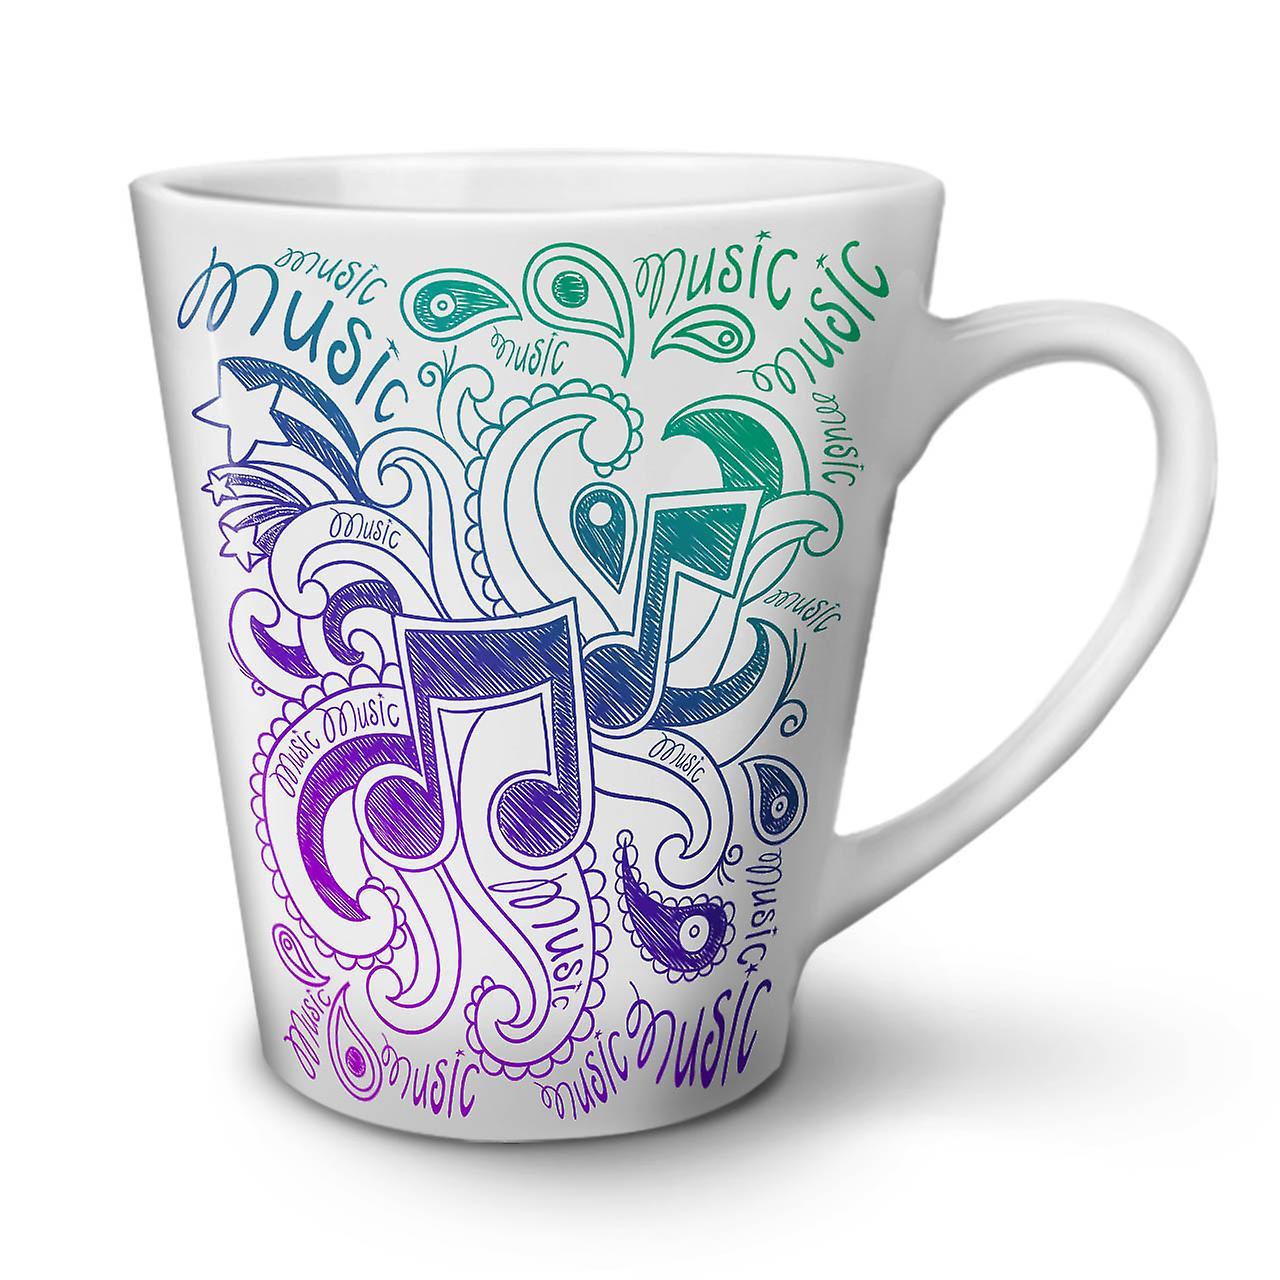 Nouvelle Café Céramique En Latte Ornement Blanche Musical Tasse 12 OzWellcoda mN08nwvO